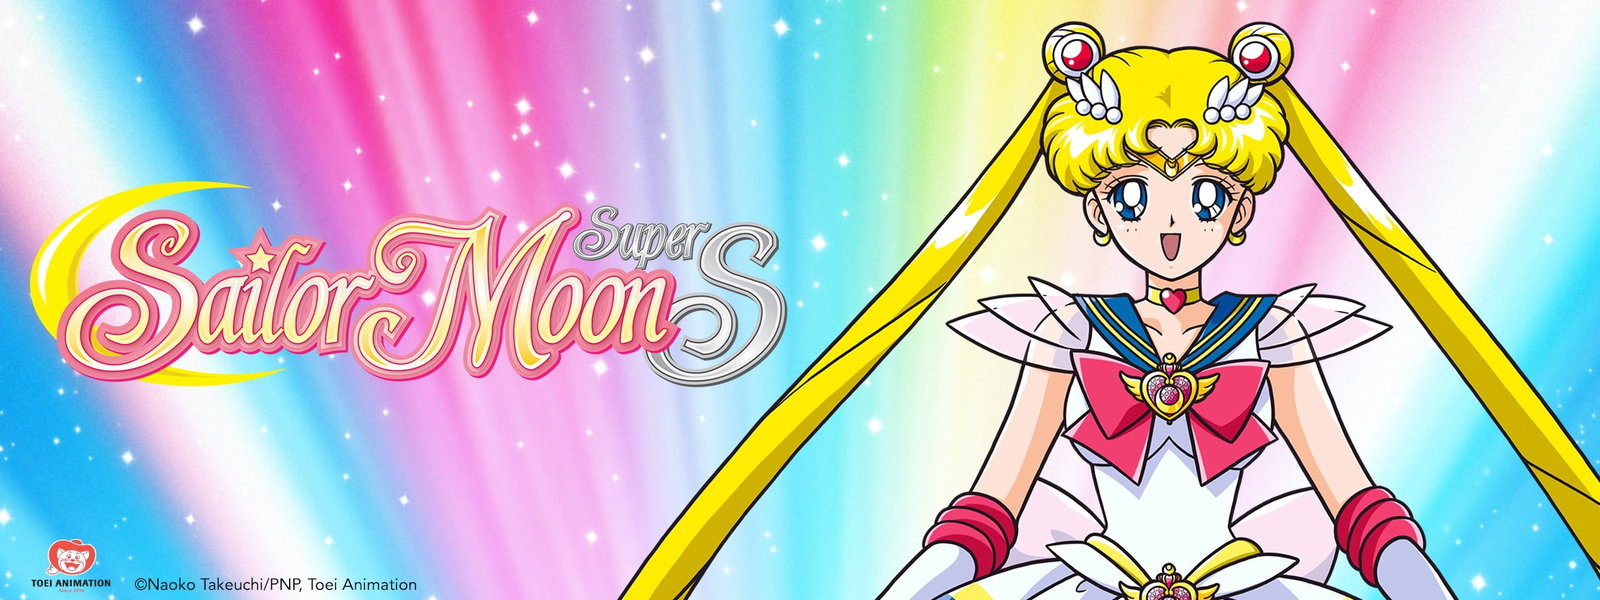 Uncategorized Sailor Moon Online watch sailor moon online at hulu moon